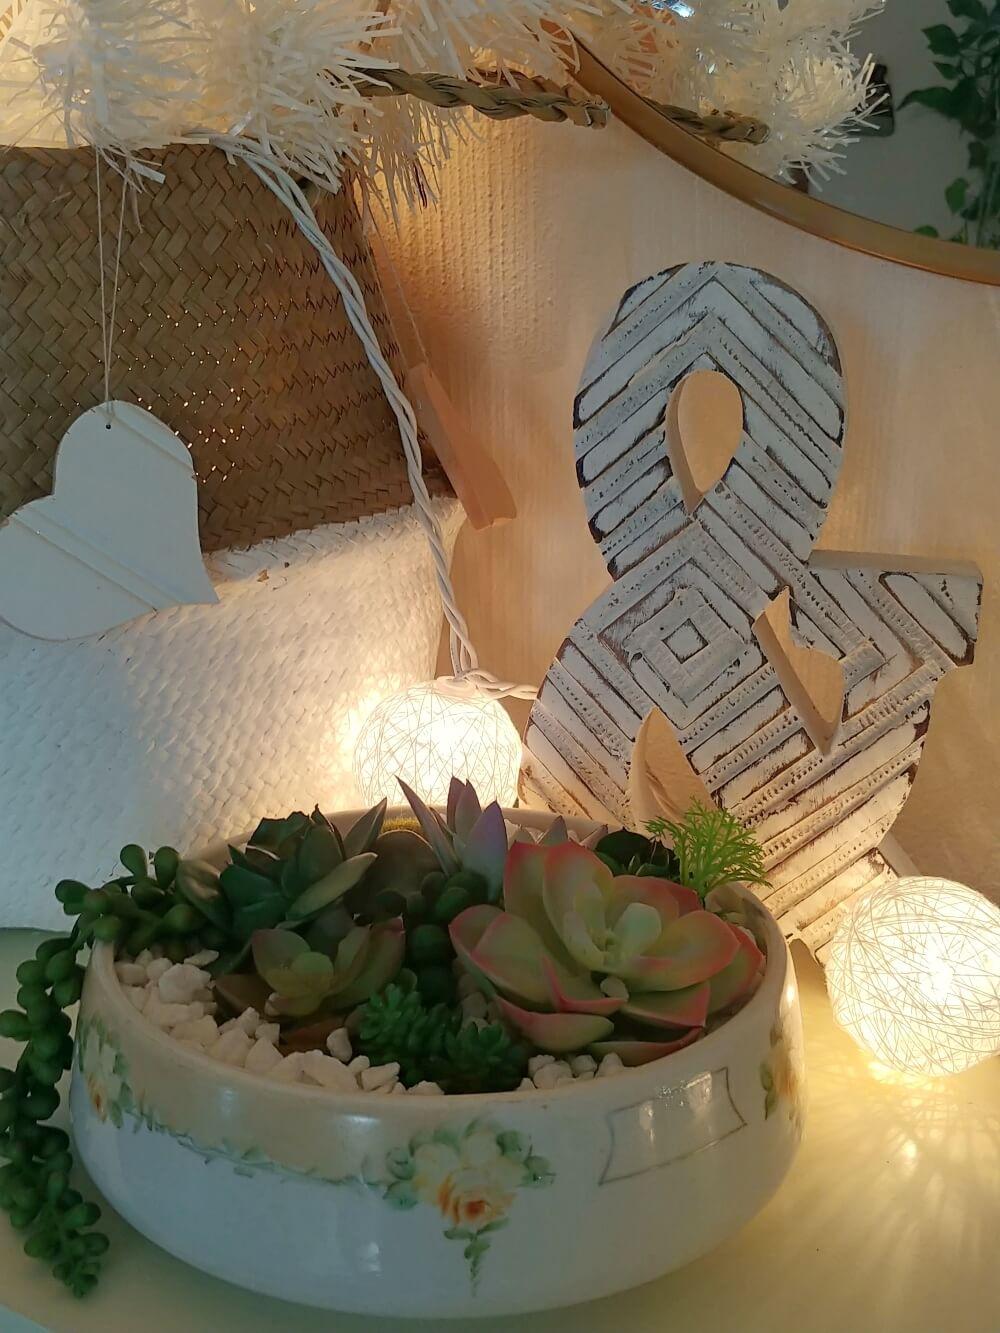 https://www.littlevintagecottage.com/2019/08/vintage-dish-succulent-planter-7-days.html